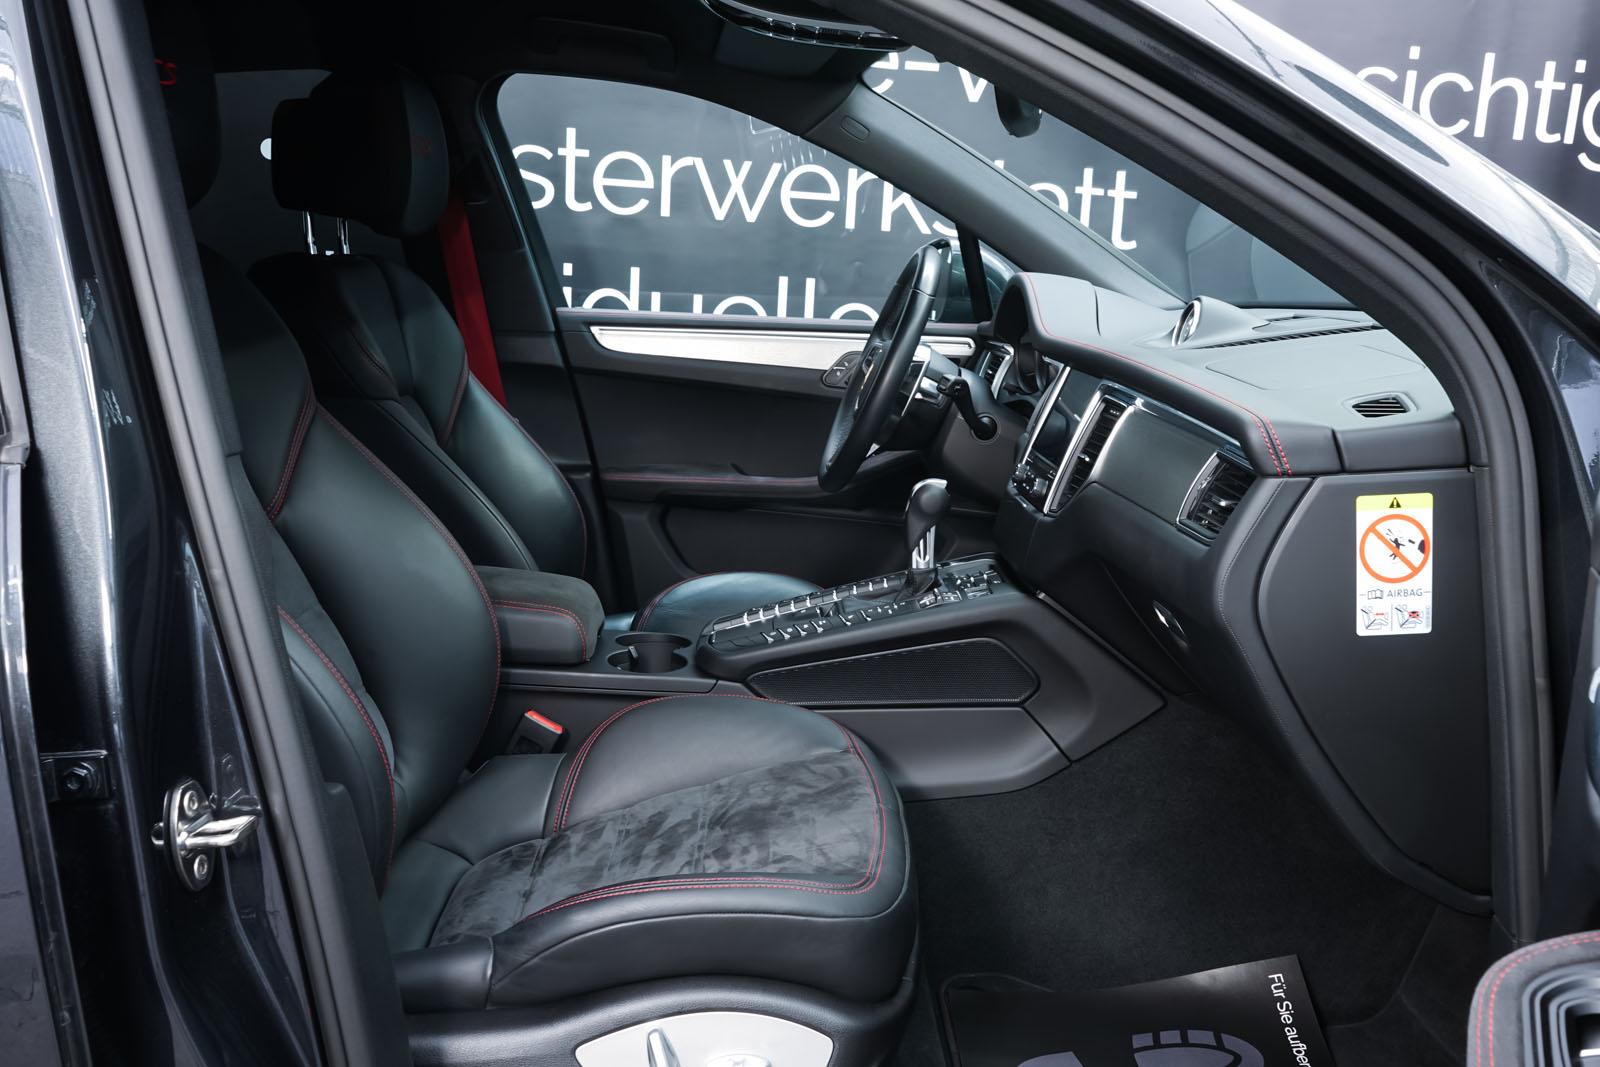 Porsche_Macan_GTS_Dunkelgrau_Schwarz_POR-8174_17_w